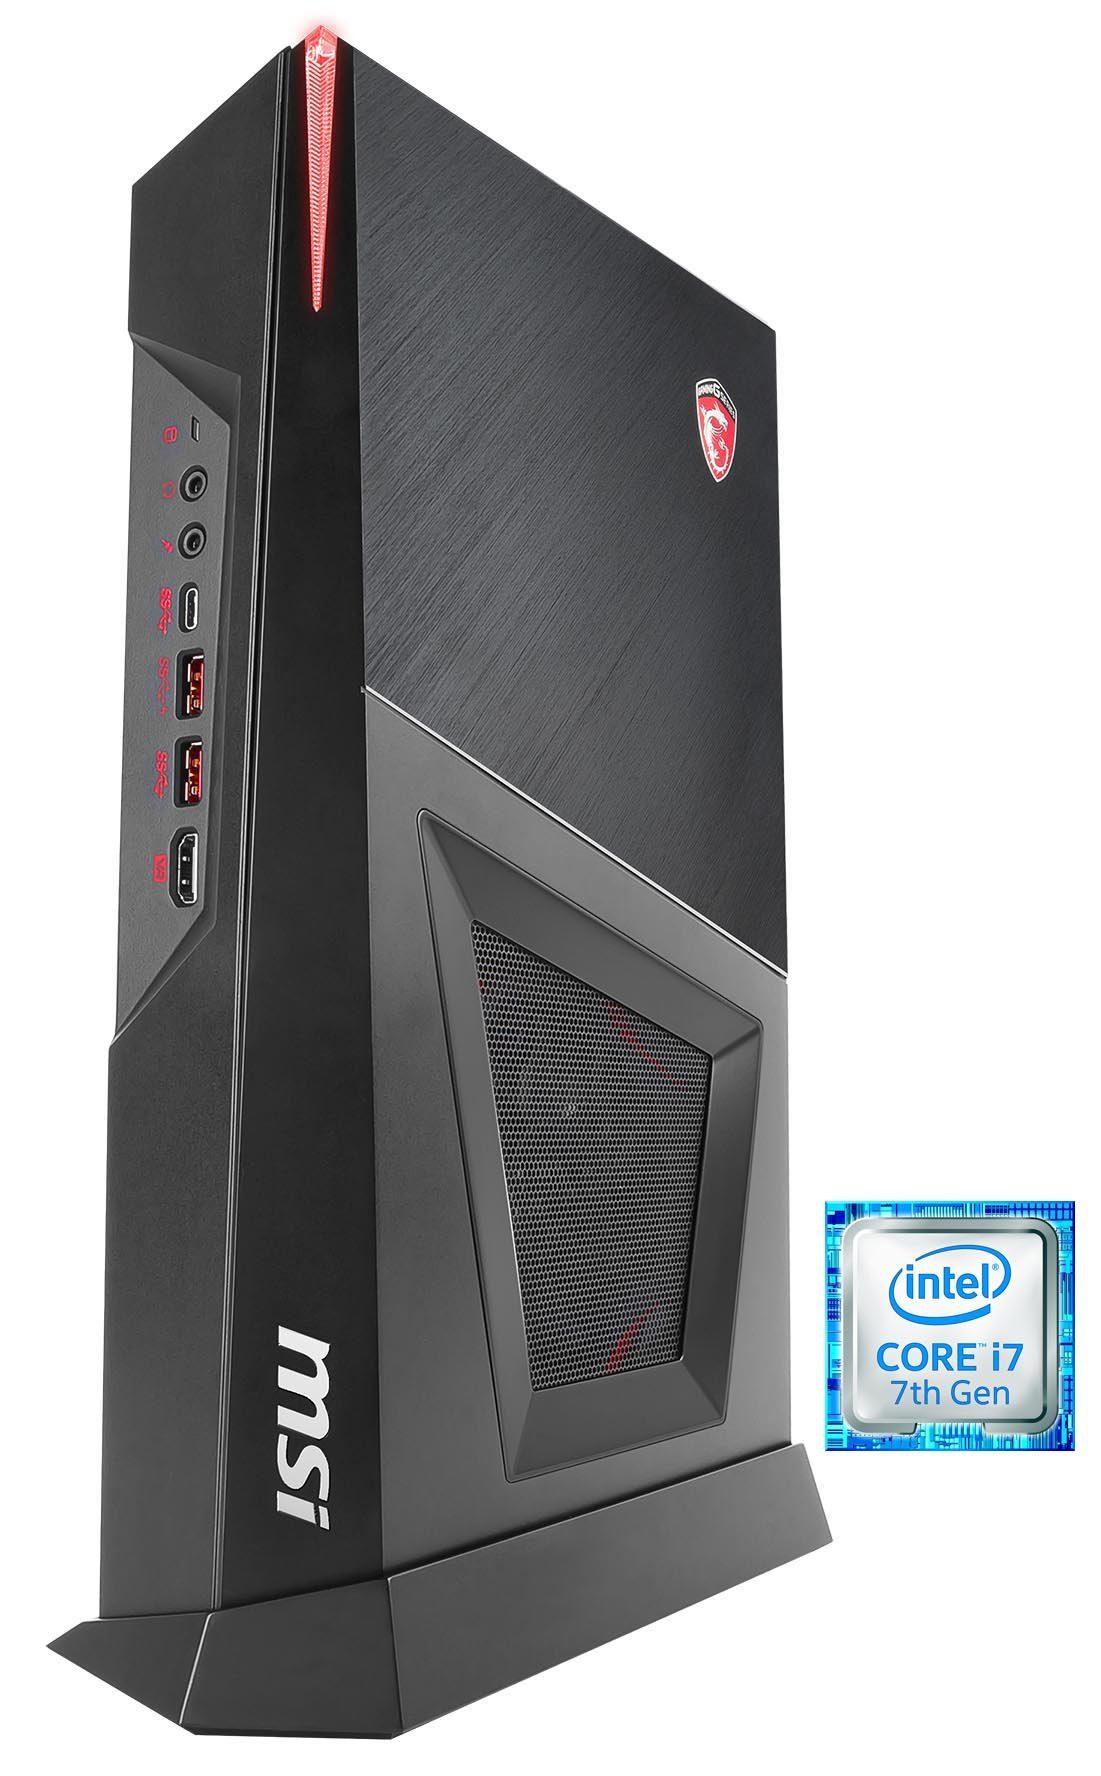 MSI Gaming PC, Intel® i7-7700, 8GB, SSD + HDD, GeForce® GTX 1060 »Trident 3 VR7RC-031DE«